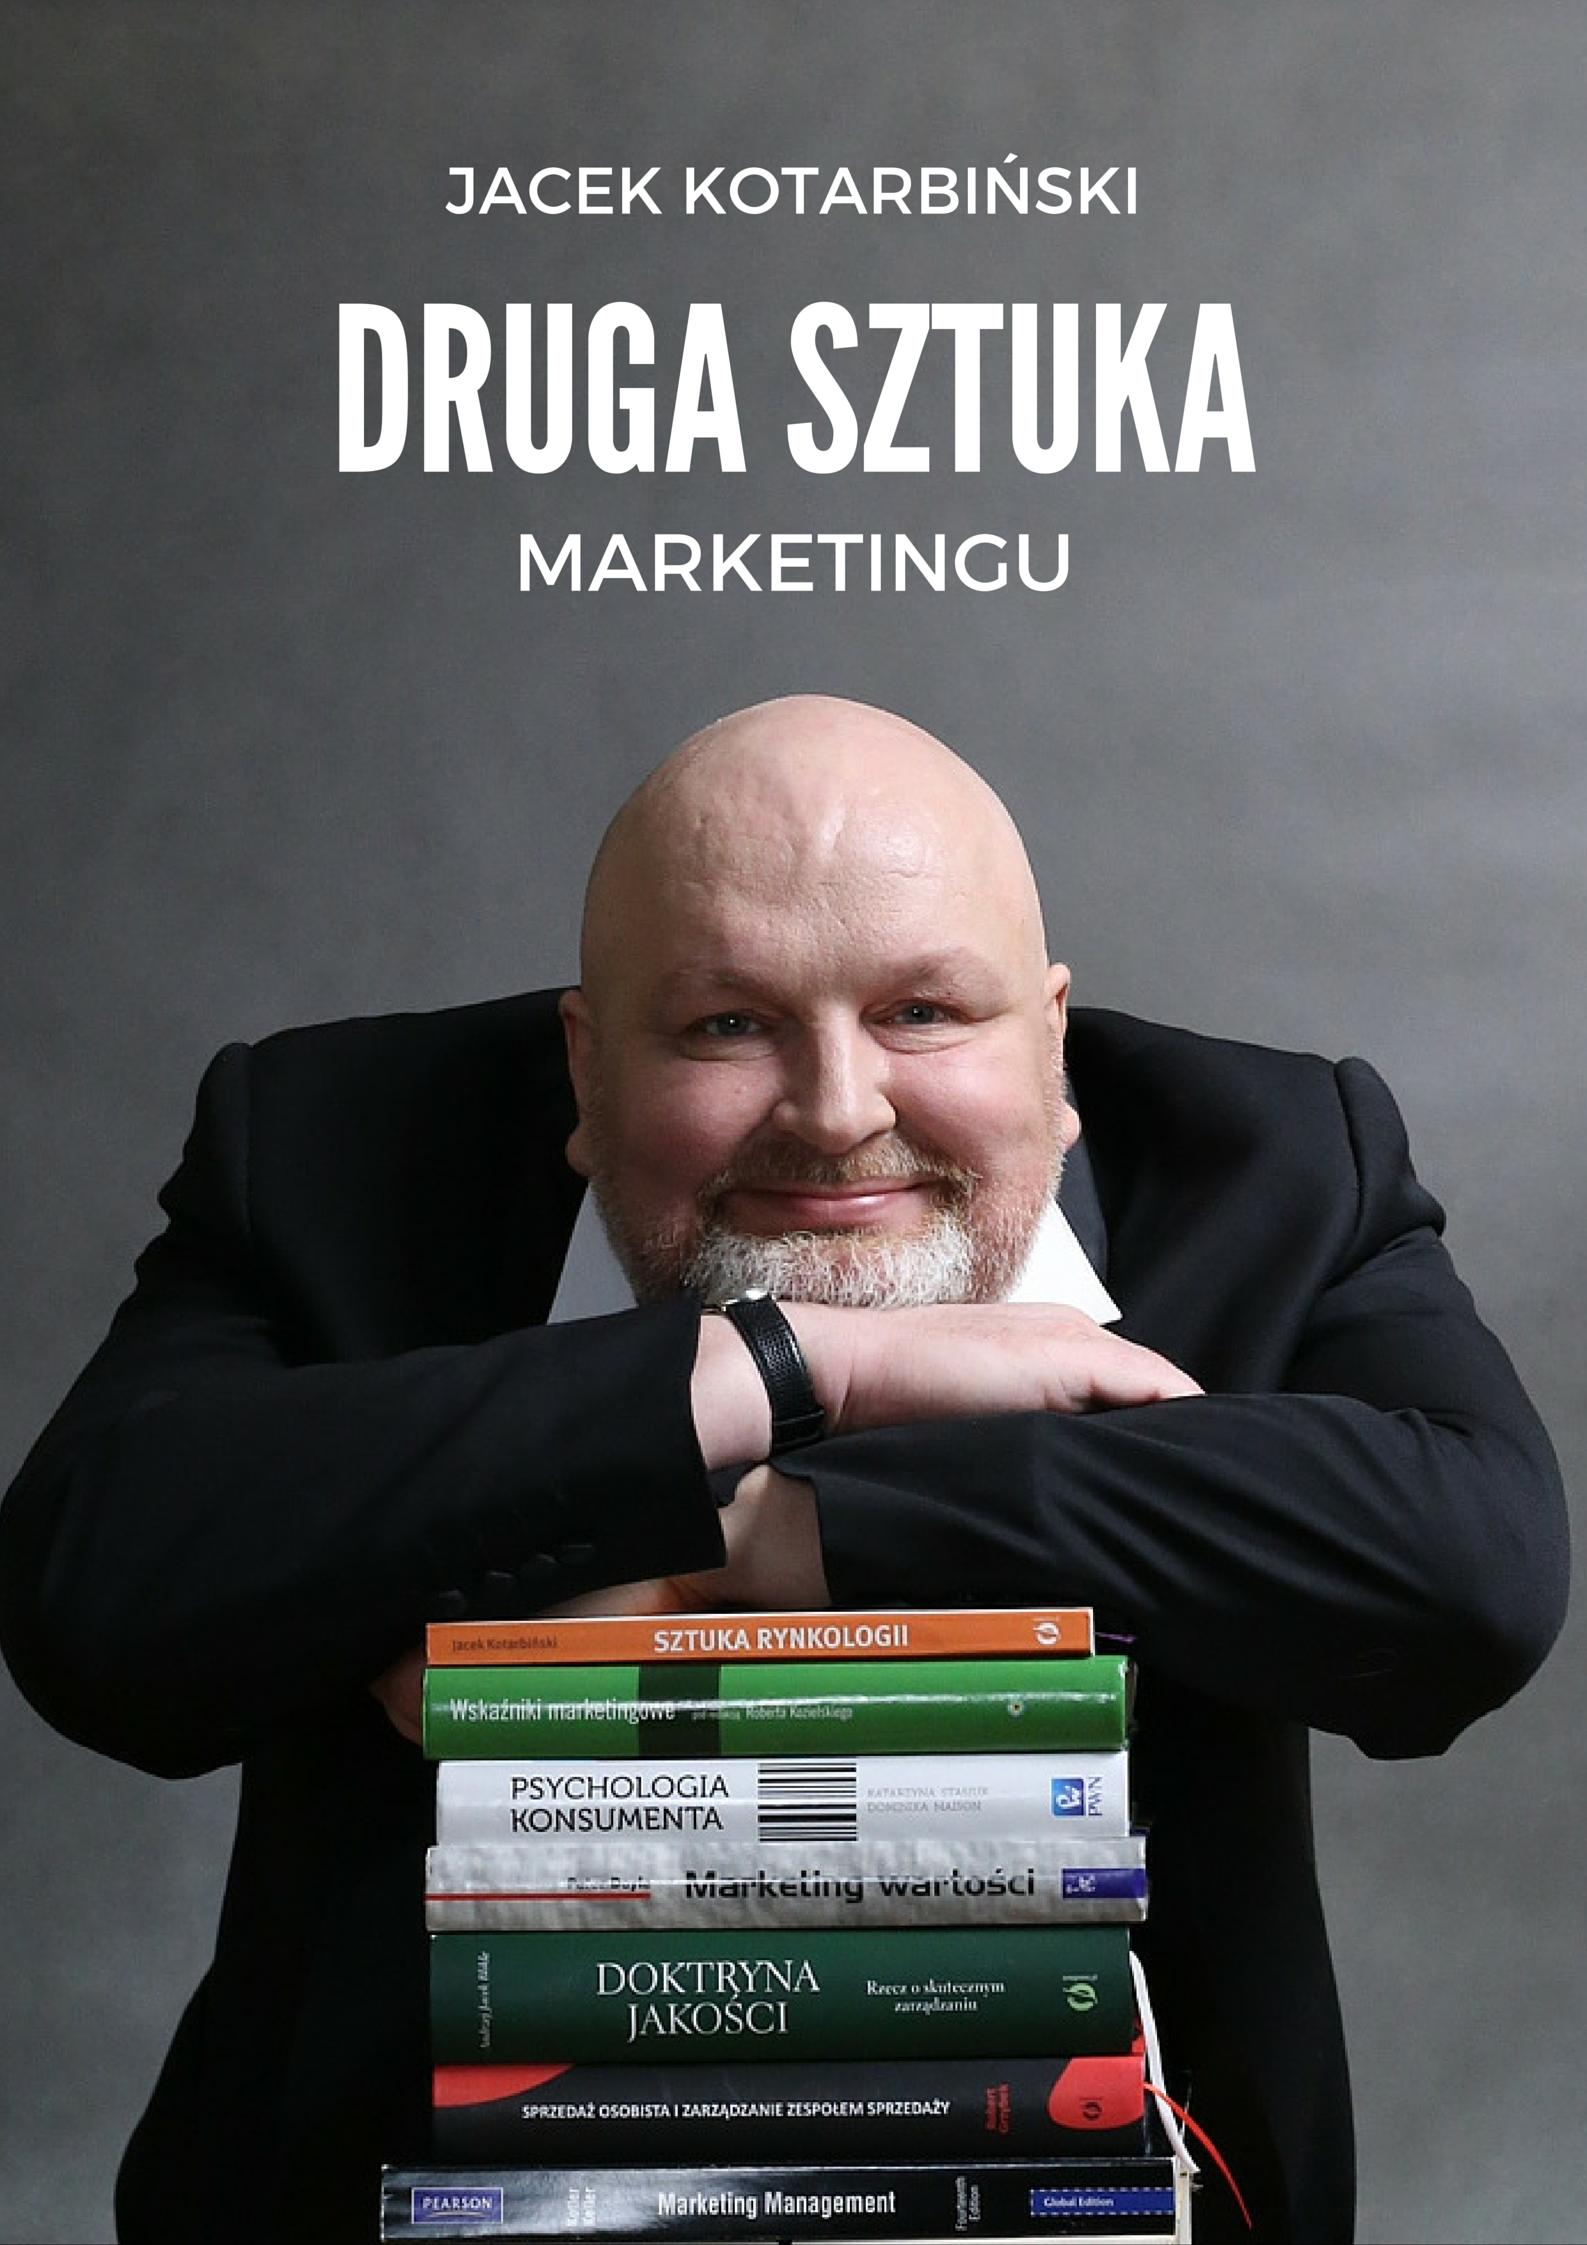 druga sztuka marketingu jacek kotarbinski